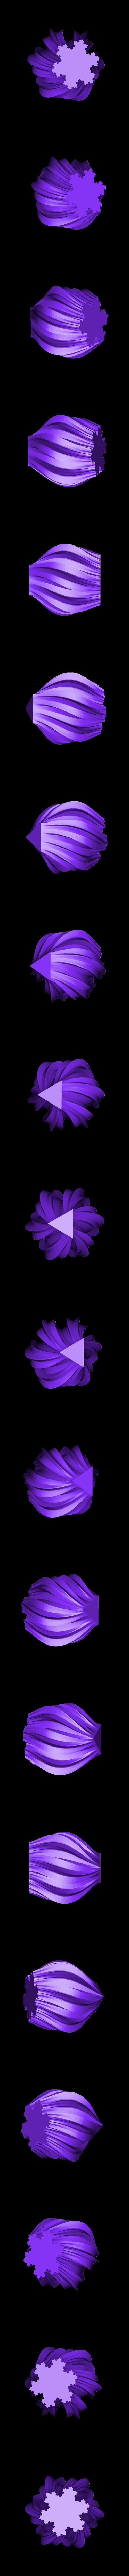 Koch_SnowflakeTwistySmoothTribase.stl Download free STL file Yet More Twisting Kochflake Vases • 3D printing template, Revalia6D